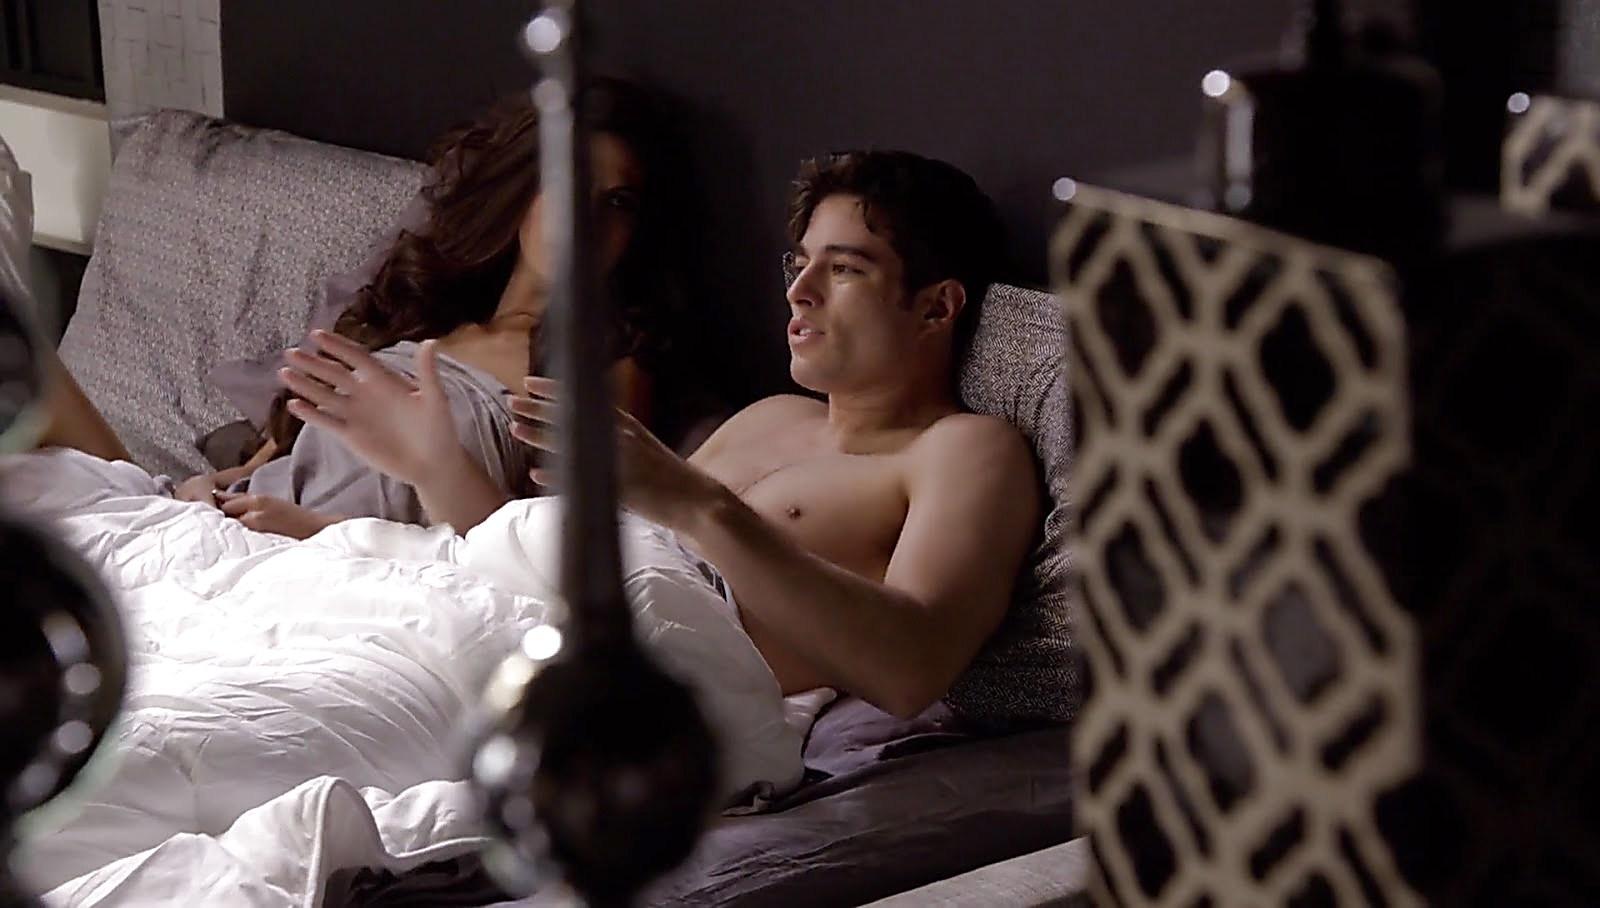 Danilo Carrera sexy shirtless scene August 22, 2017, 11am